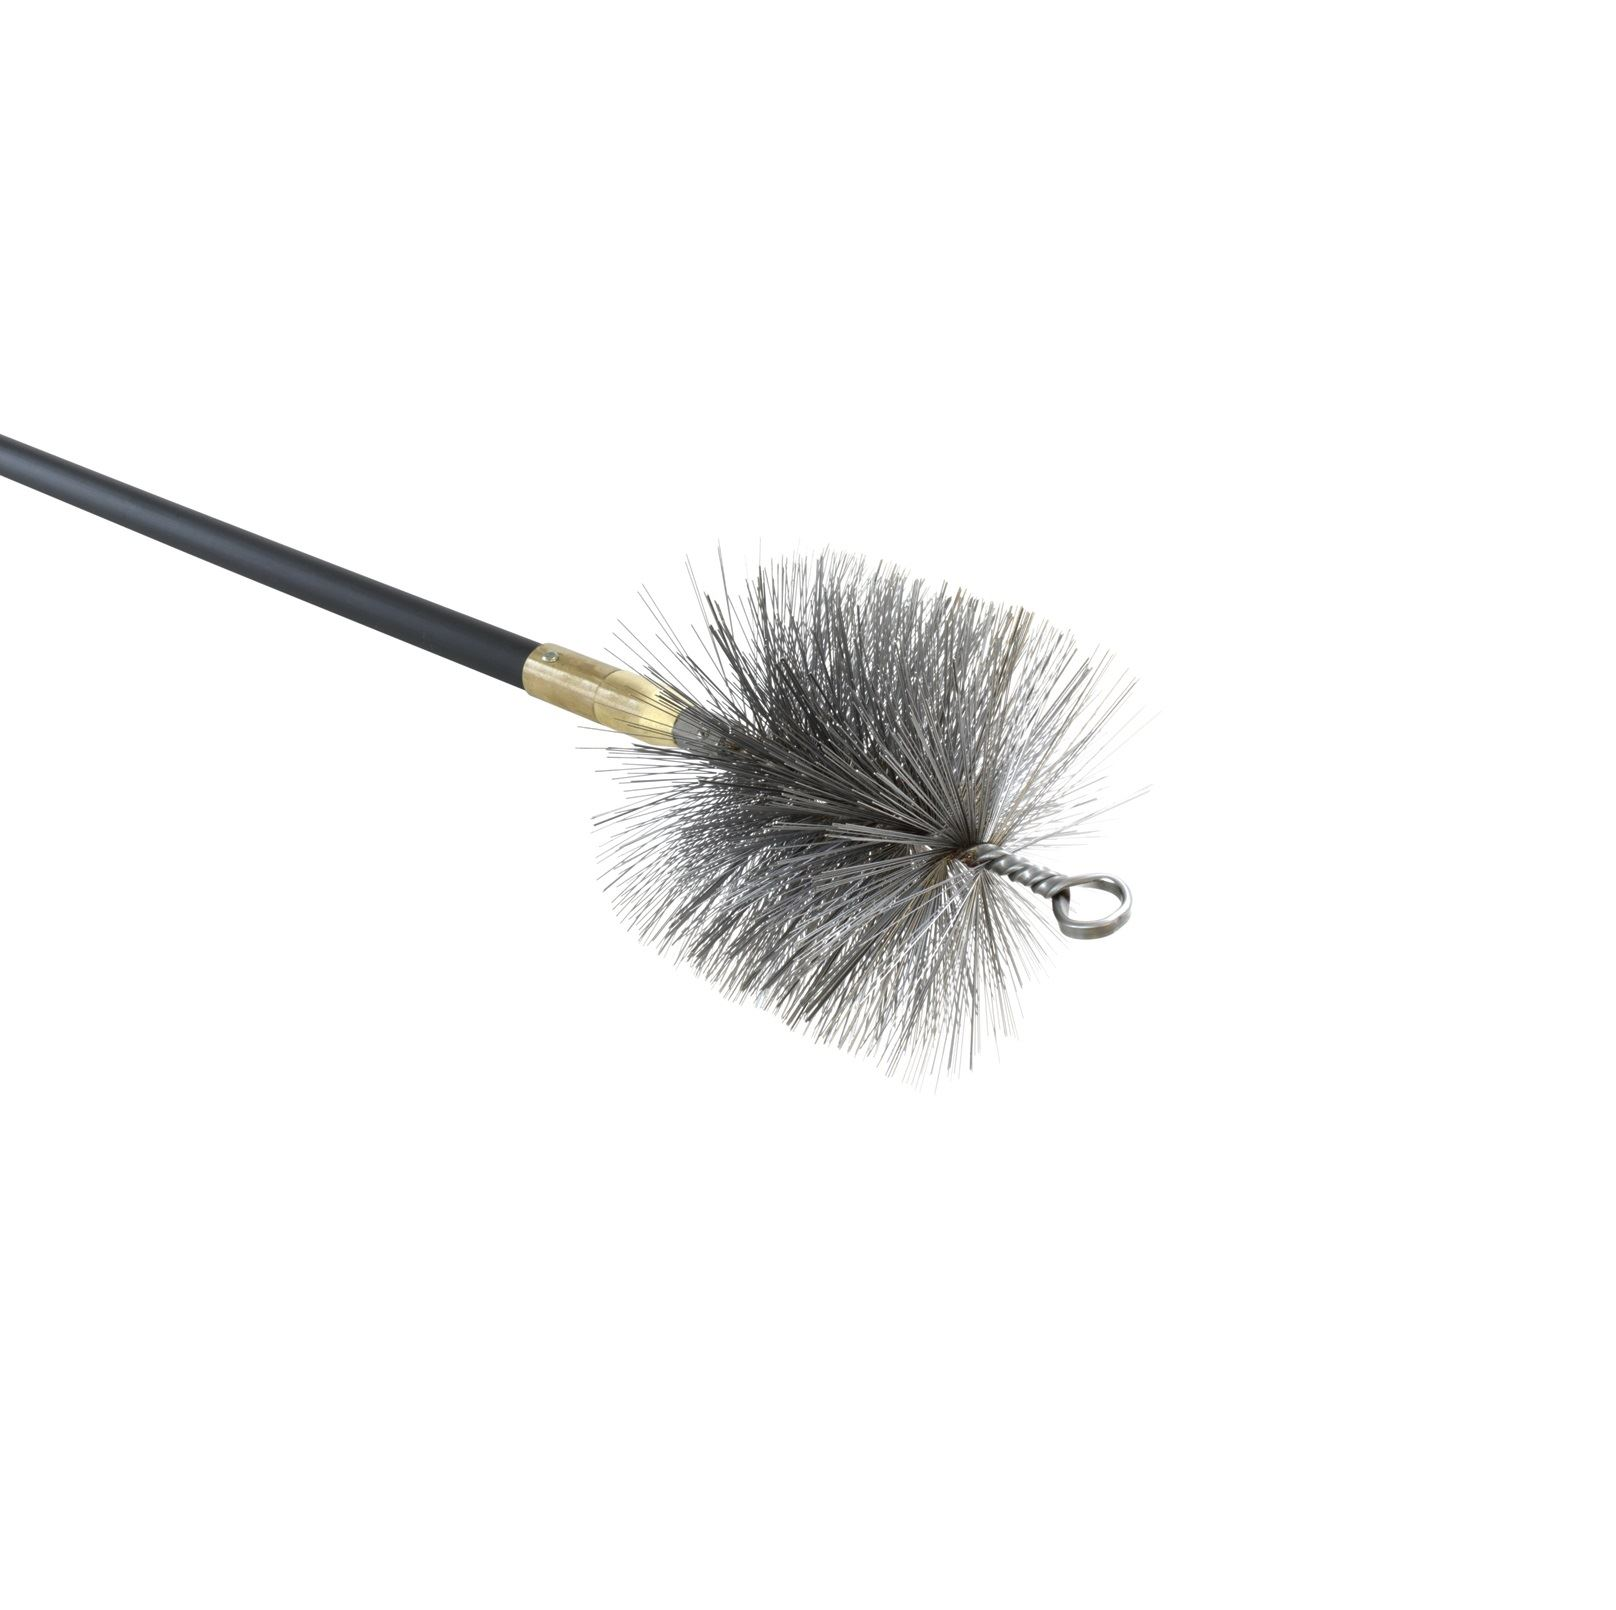 6 inch wire chimney brush